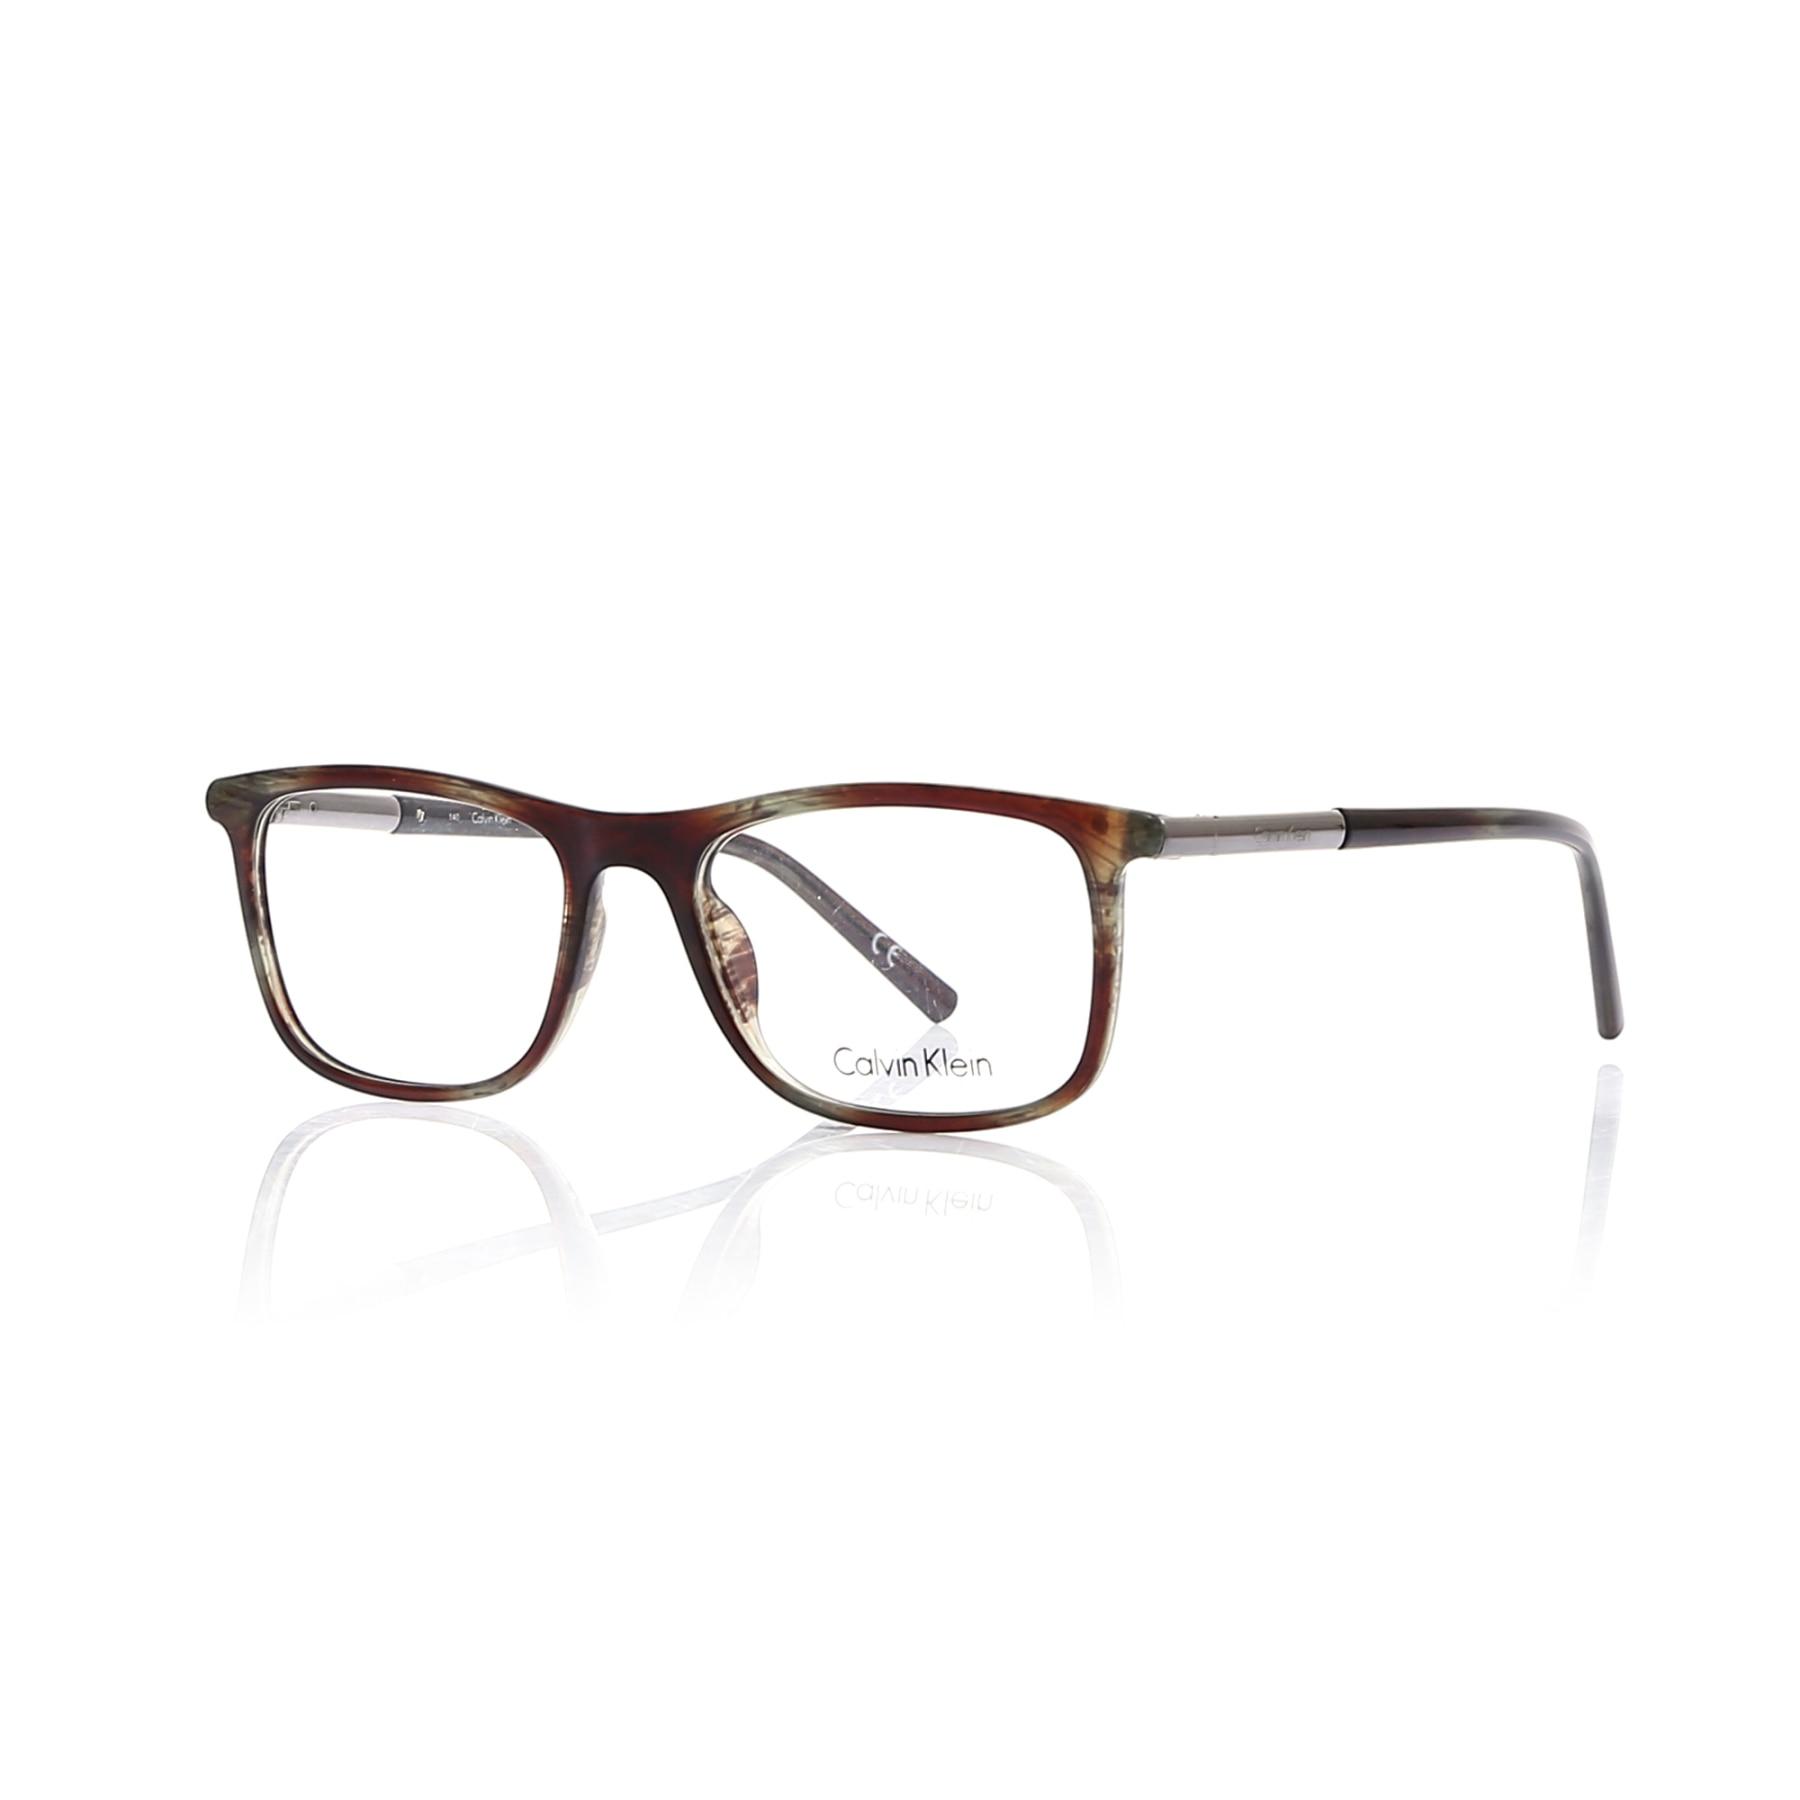 Markamilla Men Reading Glasses Light Black/ Smoked ColoredSquare Frame Demo Glasses Eyewear Transparent High Quality MenCalvin